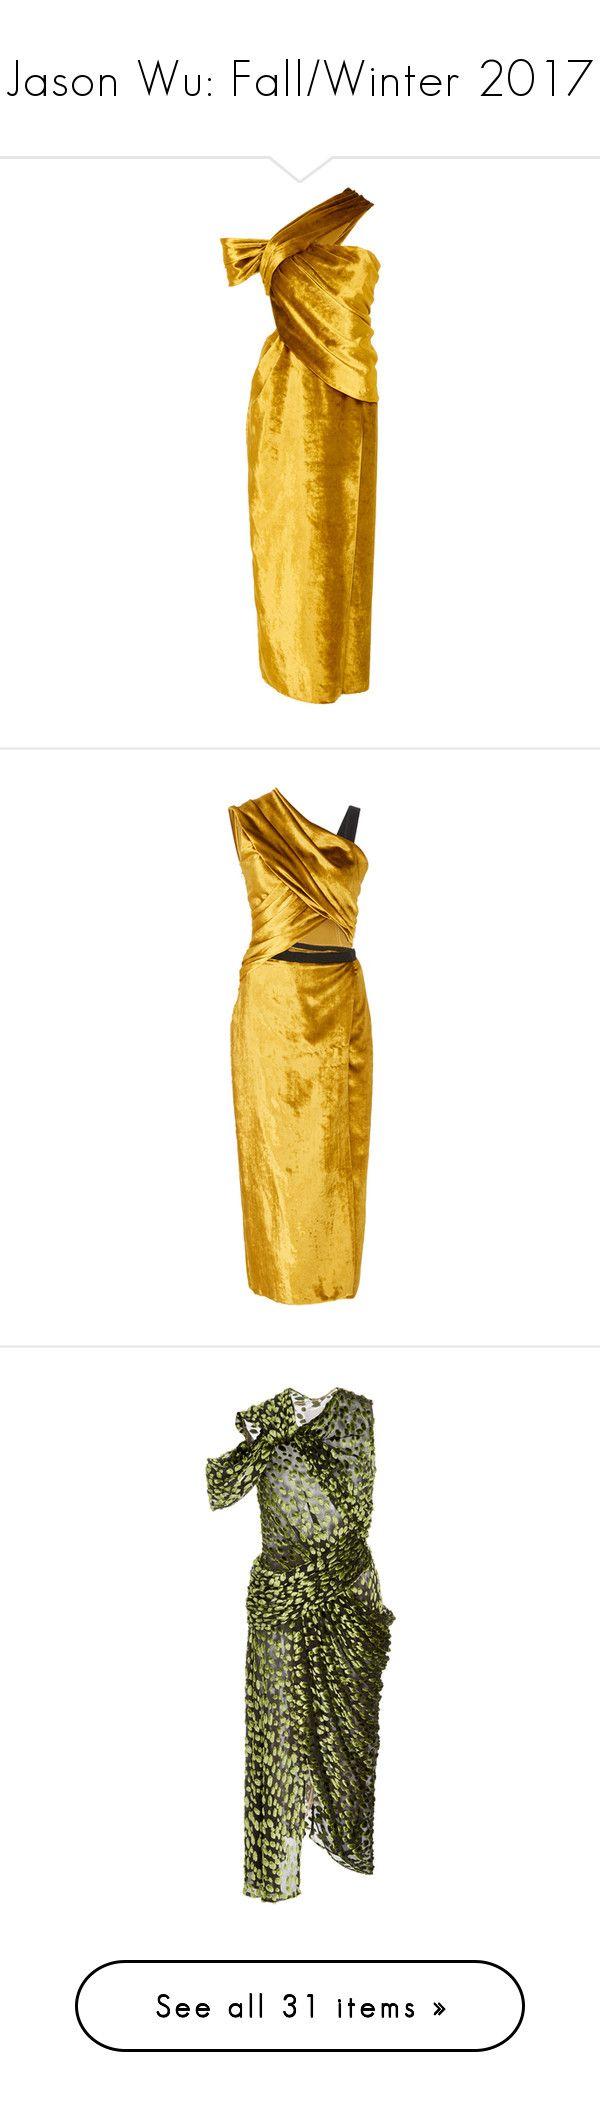 """Jason Wu: Fall/Winter 2017"" by livnd ❤ liked on Polyvore featuring JasonWu, fallwinter2017, livndfashion, livndjasonwu, dresses, jason wu, neutral, velvet dress, one sleeve cocktail dress and yellow cocktail dress"